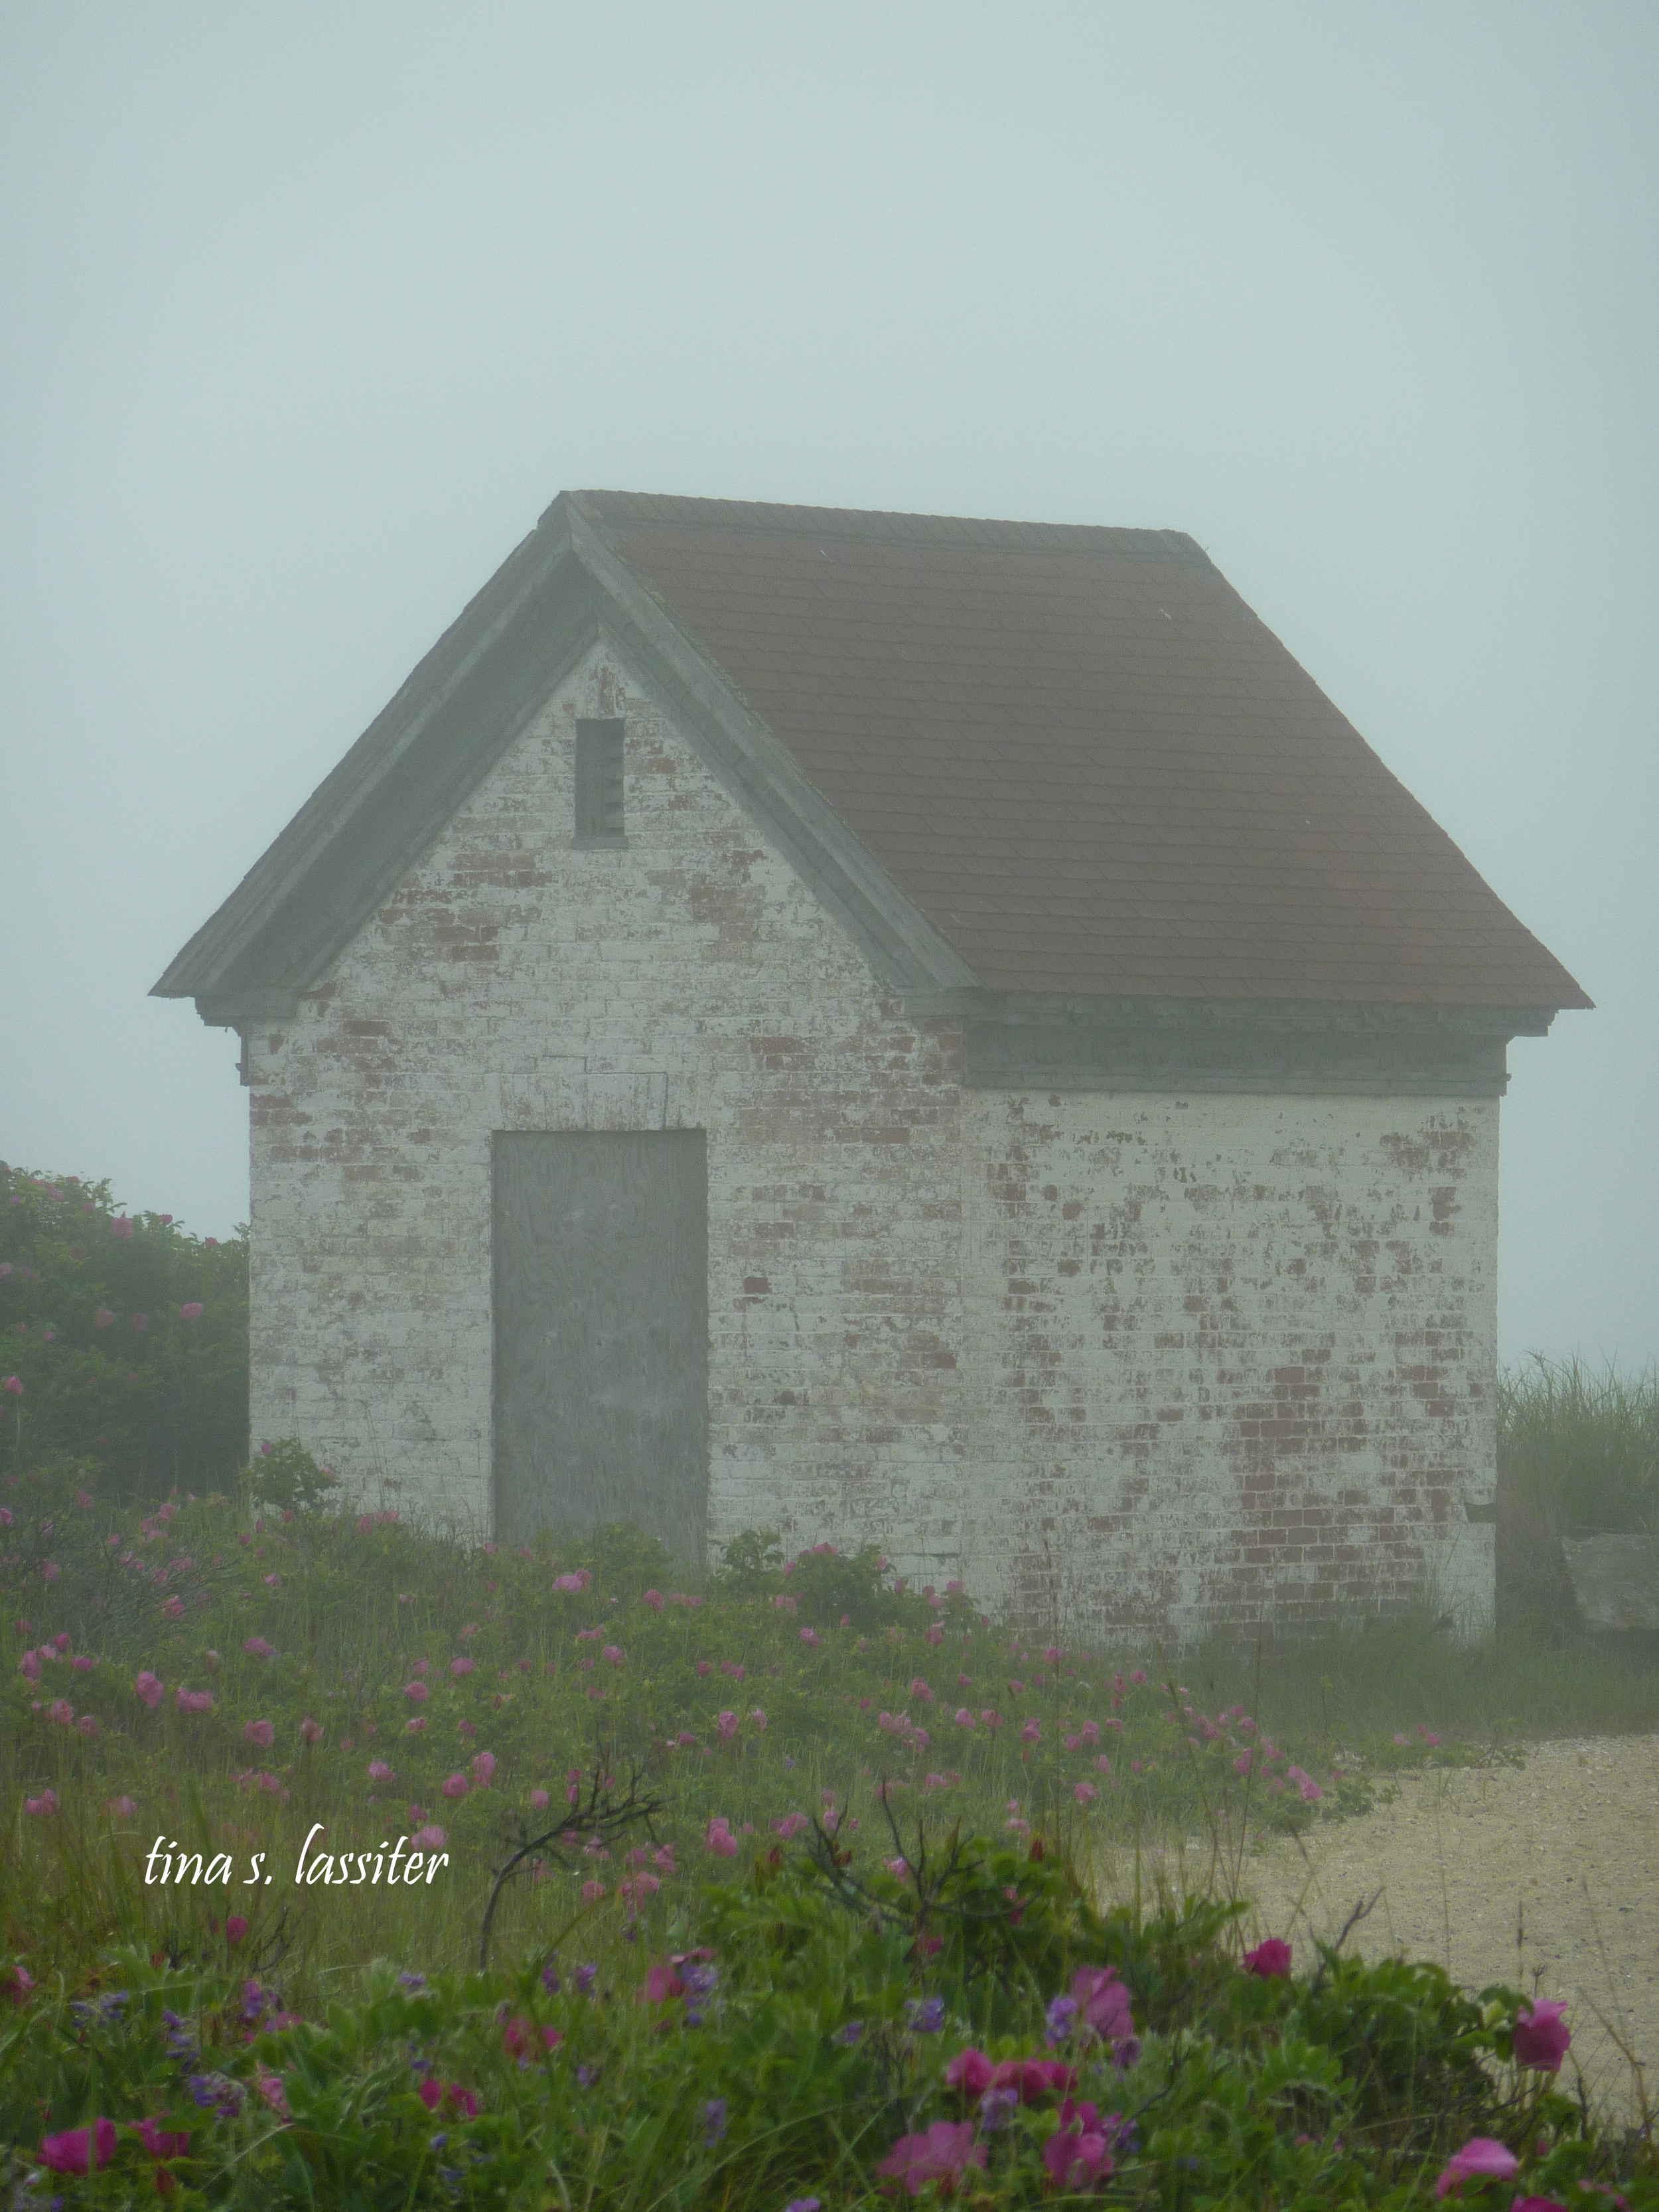 nantucket hut in fog